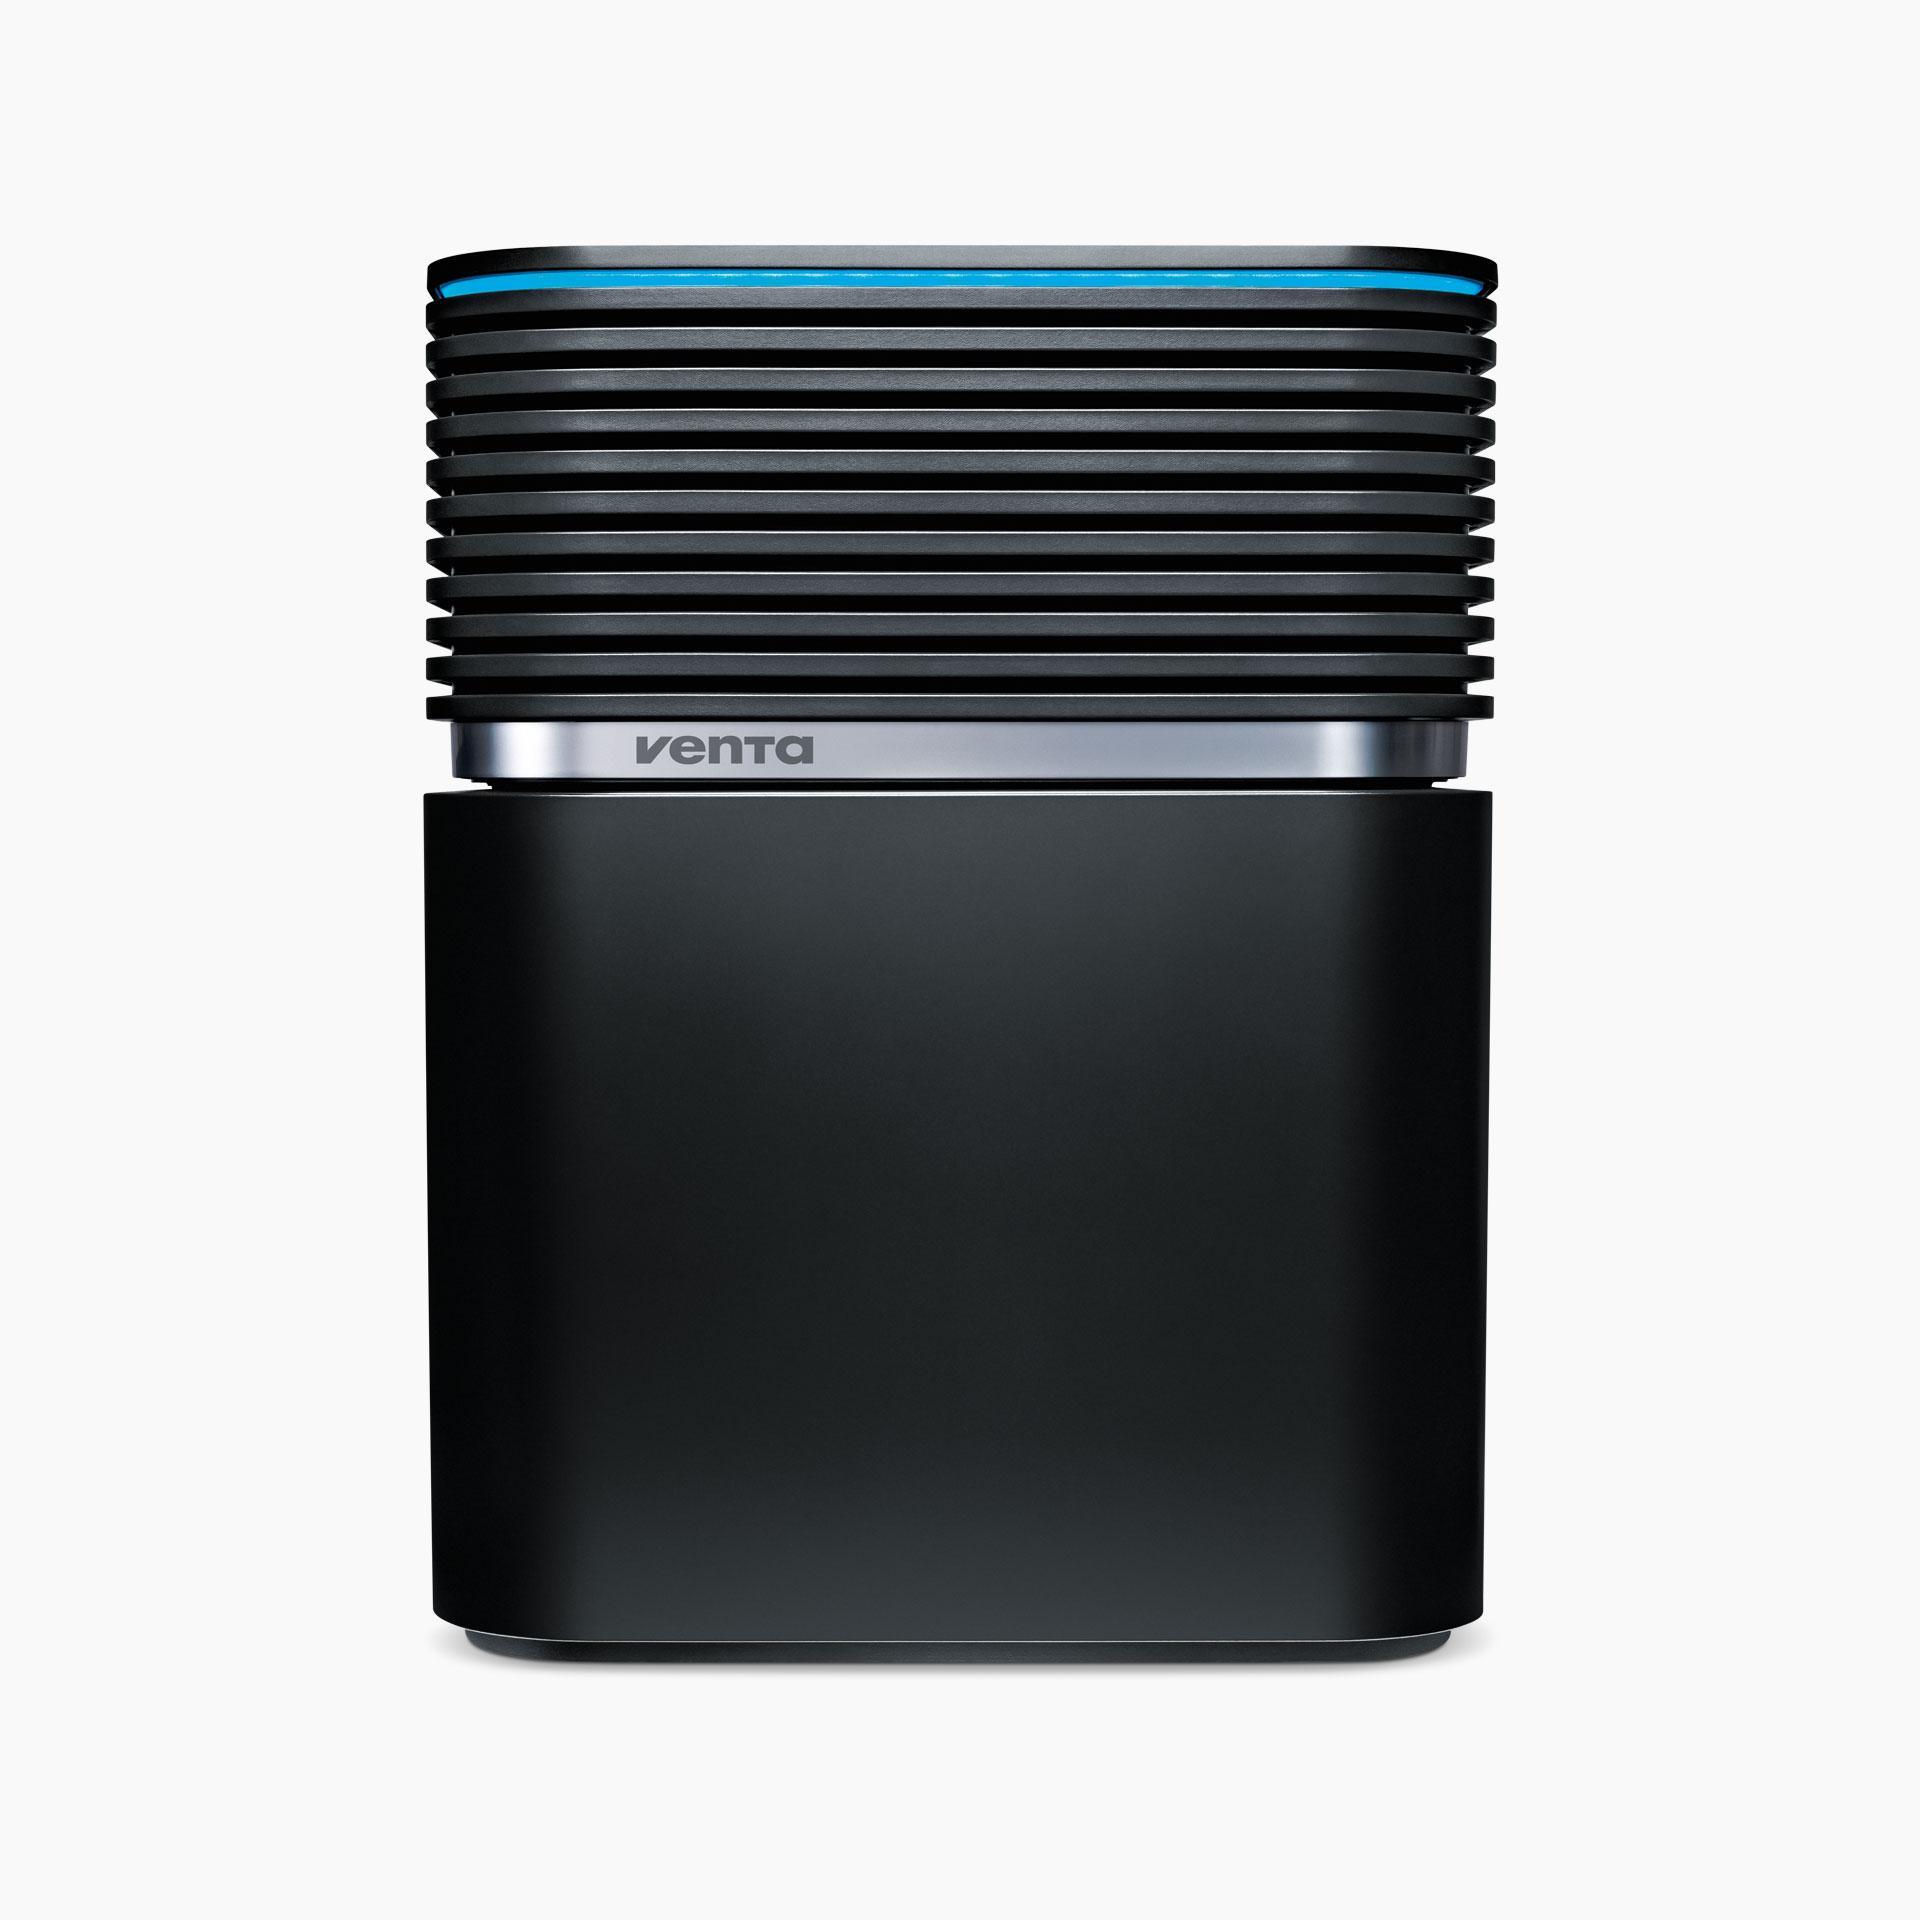 Lw74 venta aerostyle black blue front f9